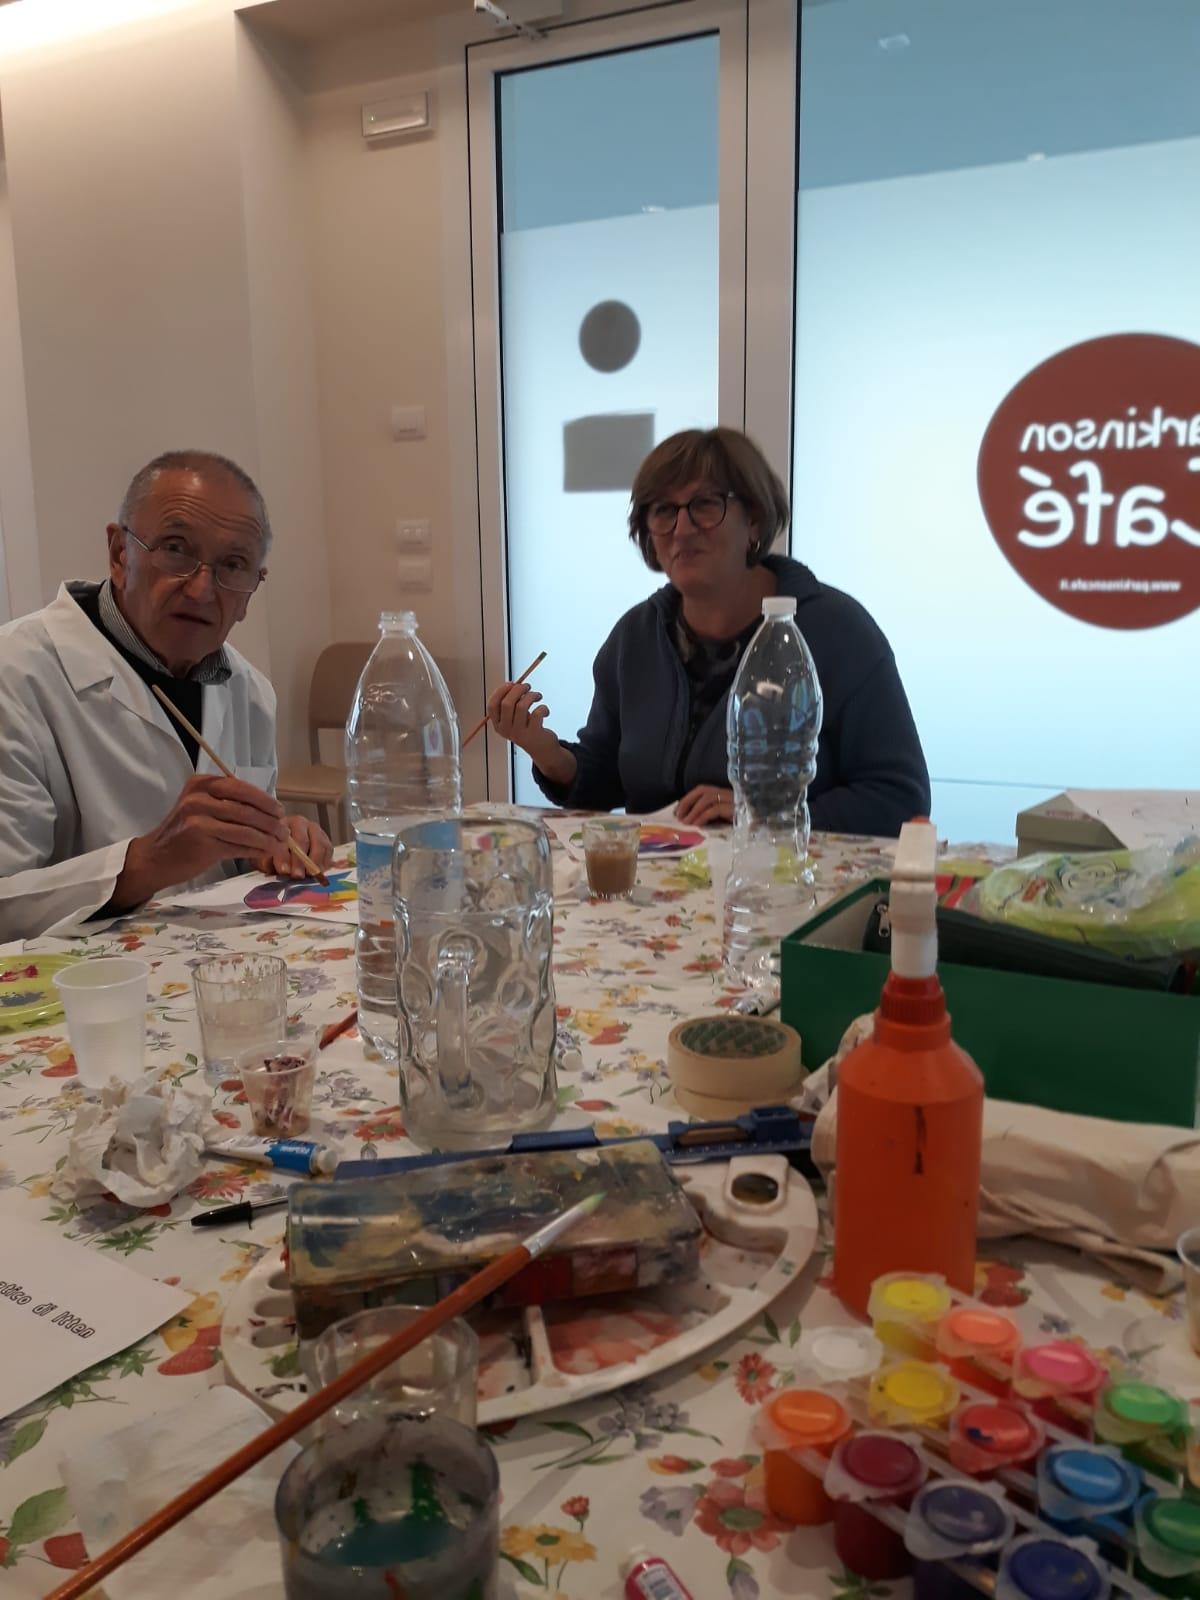 Corso pittura Parkinson cafe